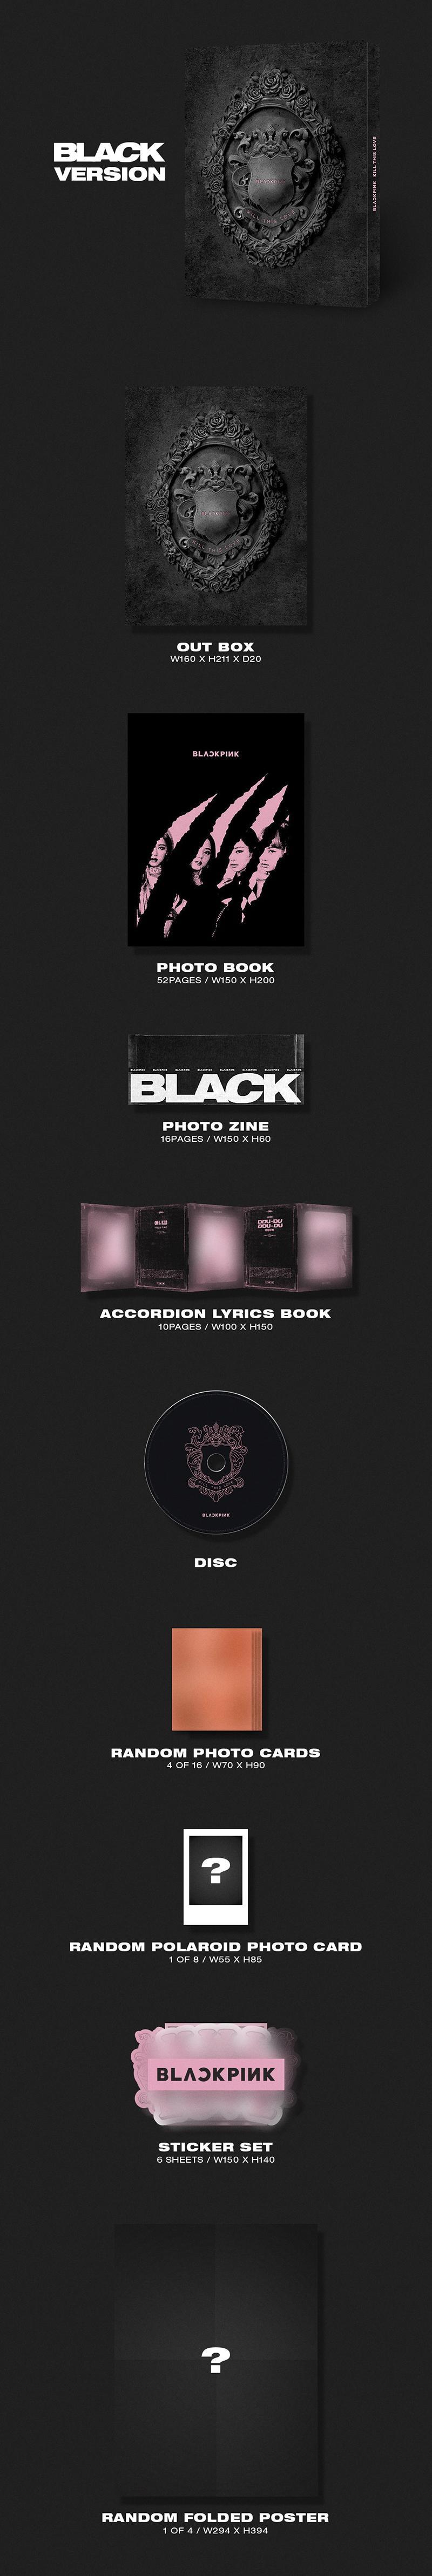 BLACKPINK Kill This Love Mini Album Black Version (Official)